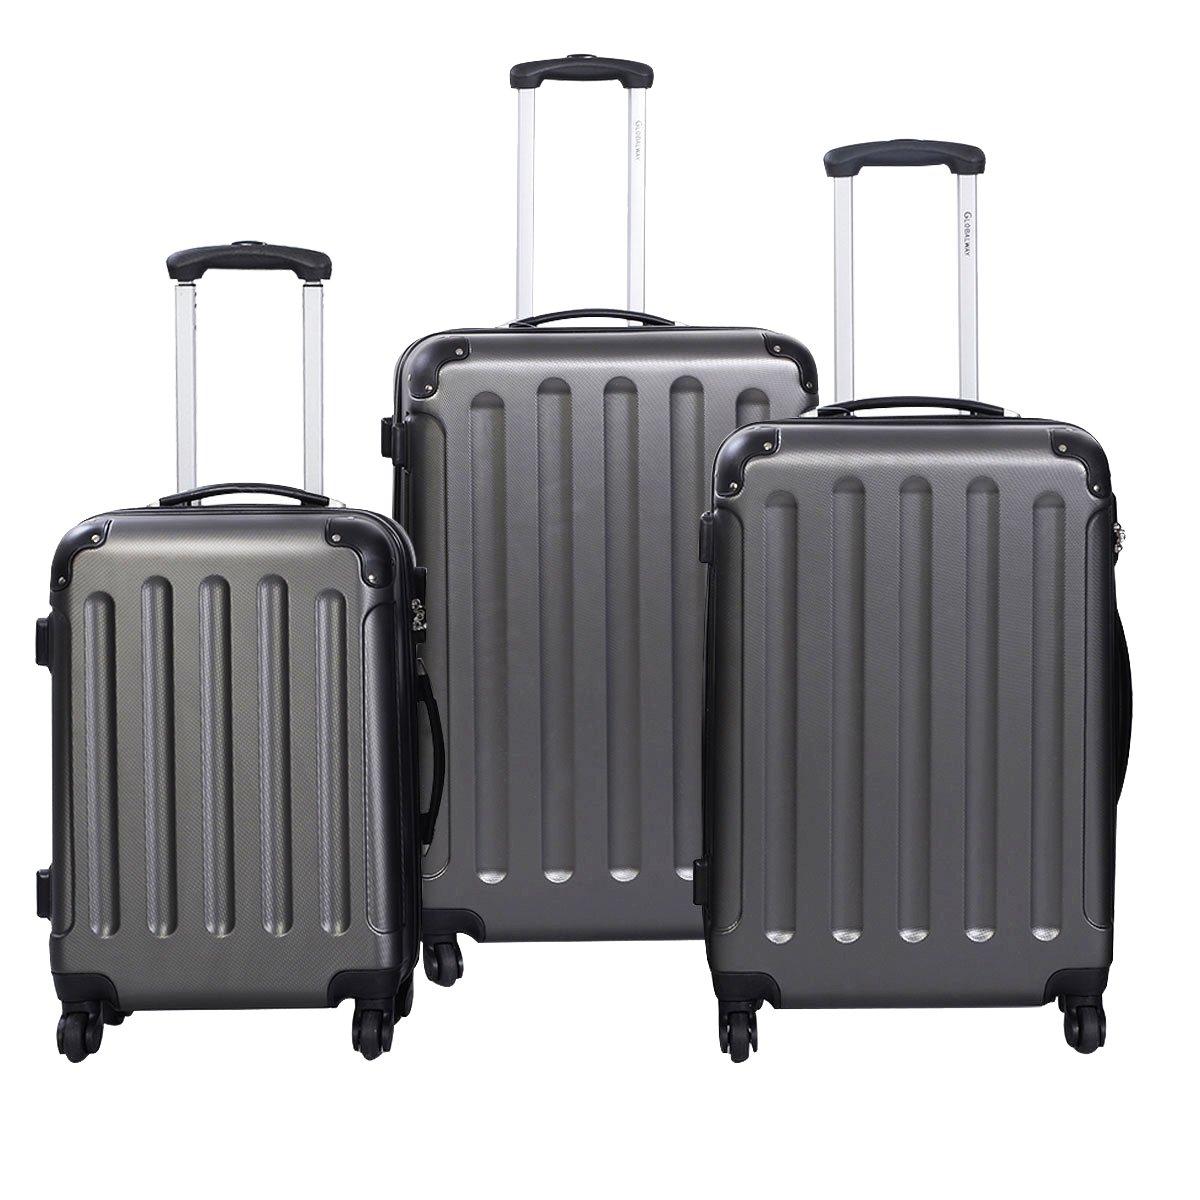 Goplus 3 Pcs Luggage Set Hardside Travel Rolling Suitcase ABS+PC Globalway (Gray) by Goplus